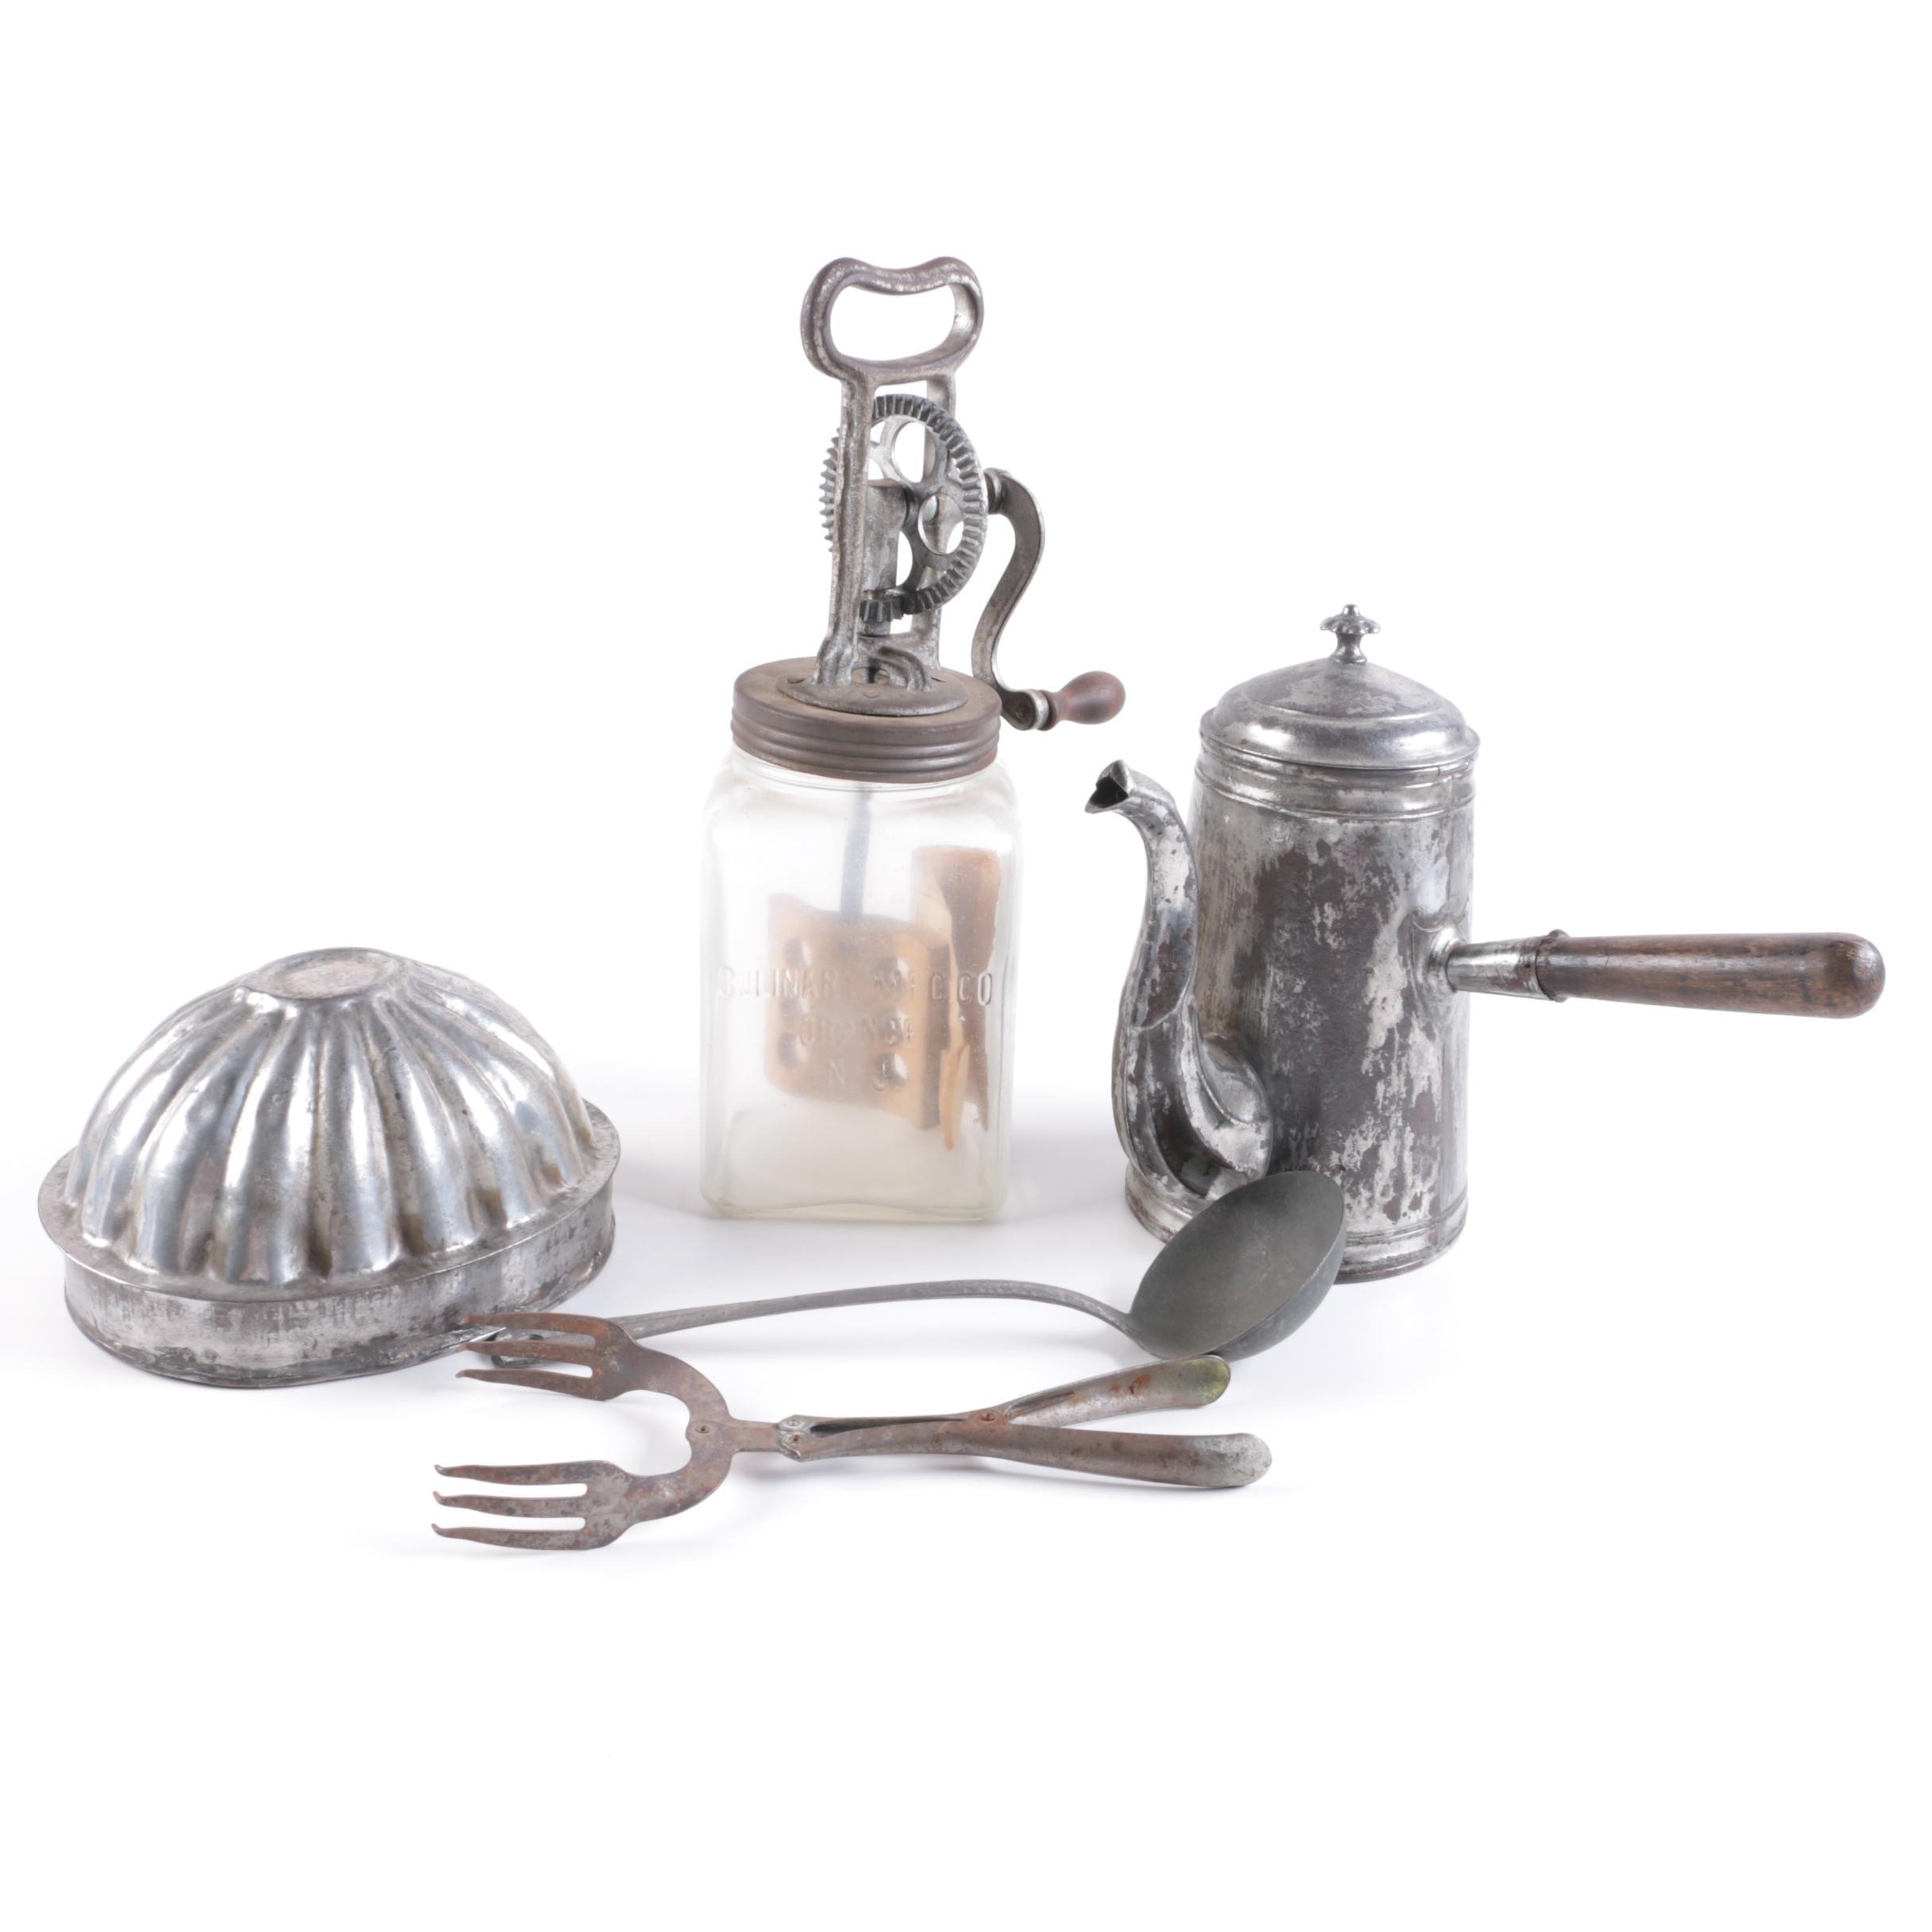 Vintage Kitchenalia Including Soviet Era Aluminium